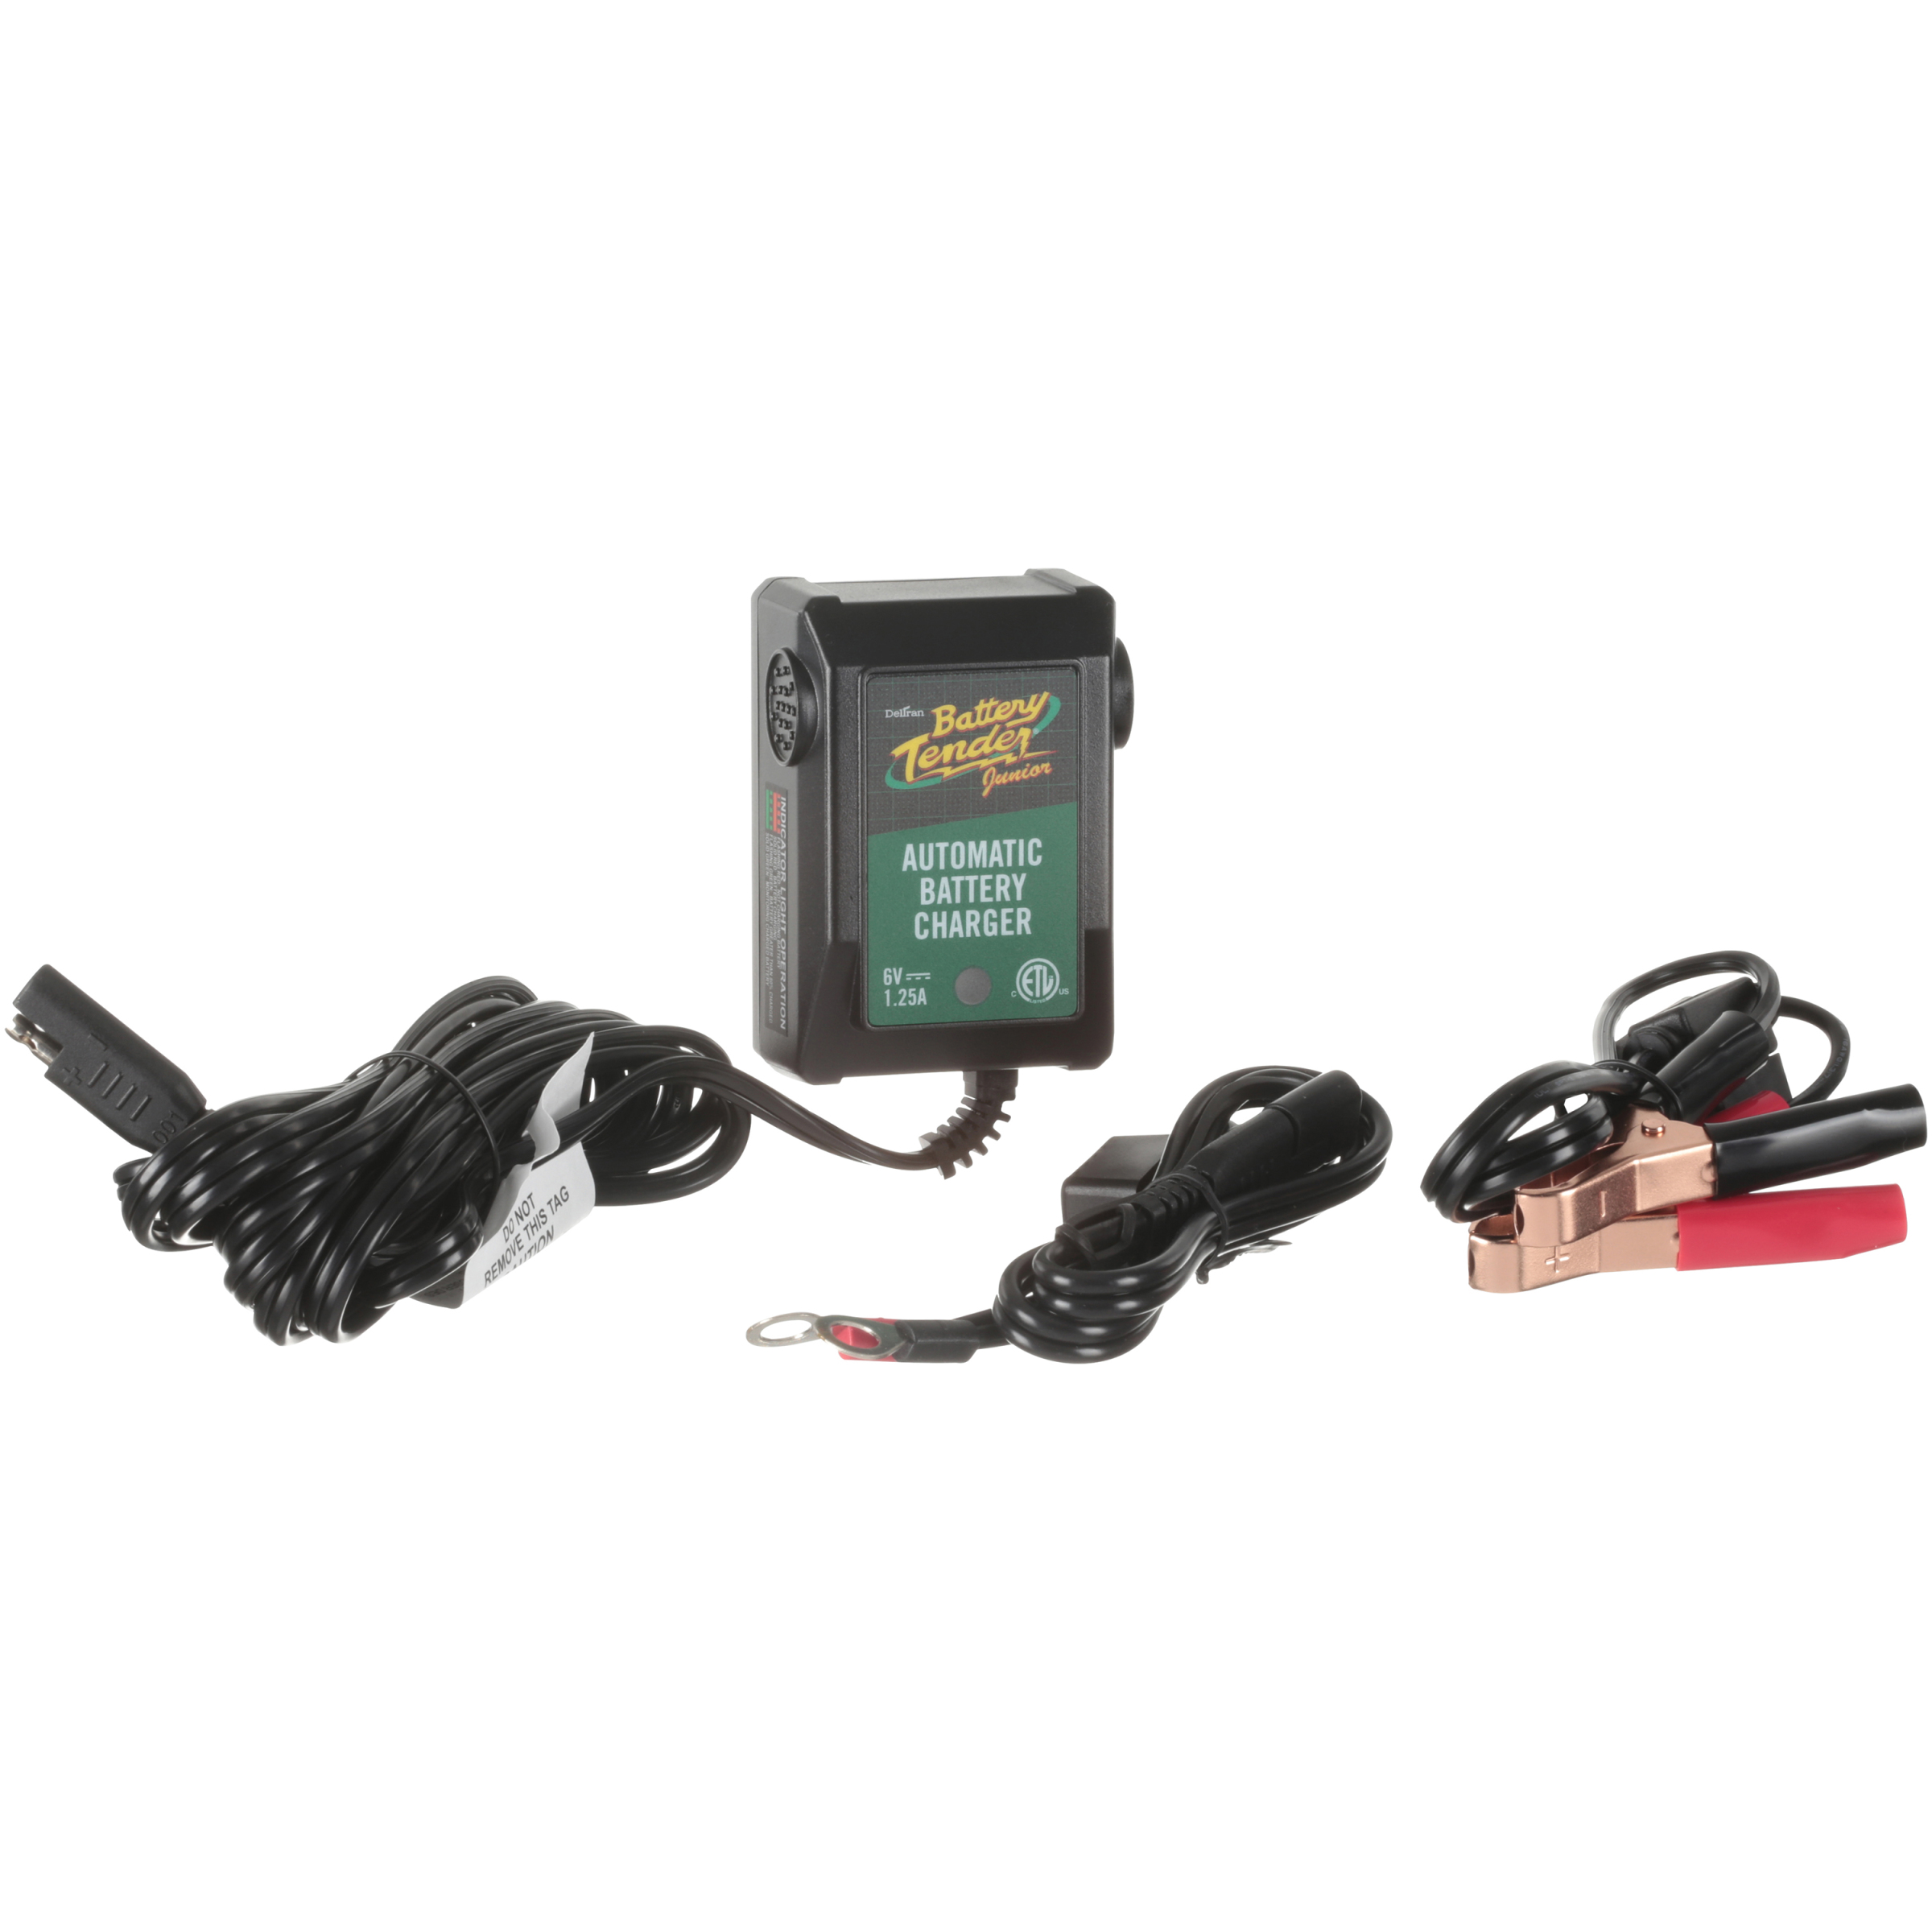 Battery Tender Jr 6V 1.25A High Efficiency